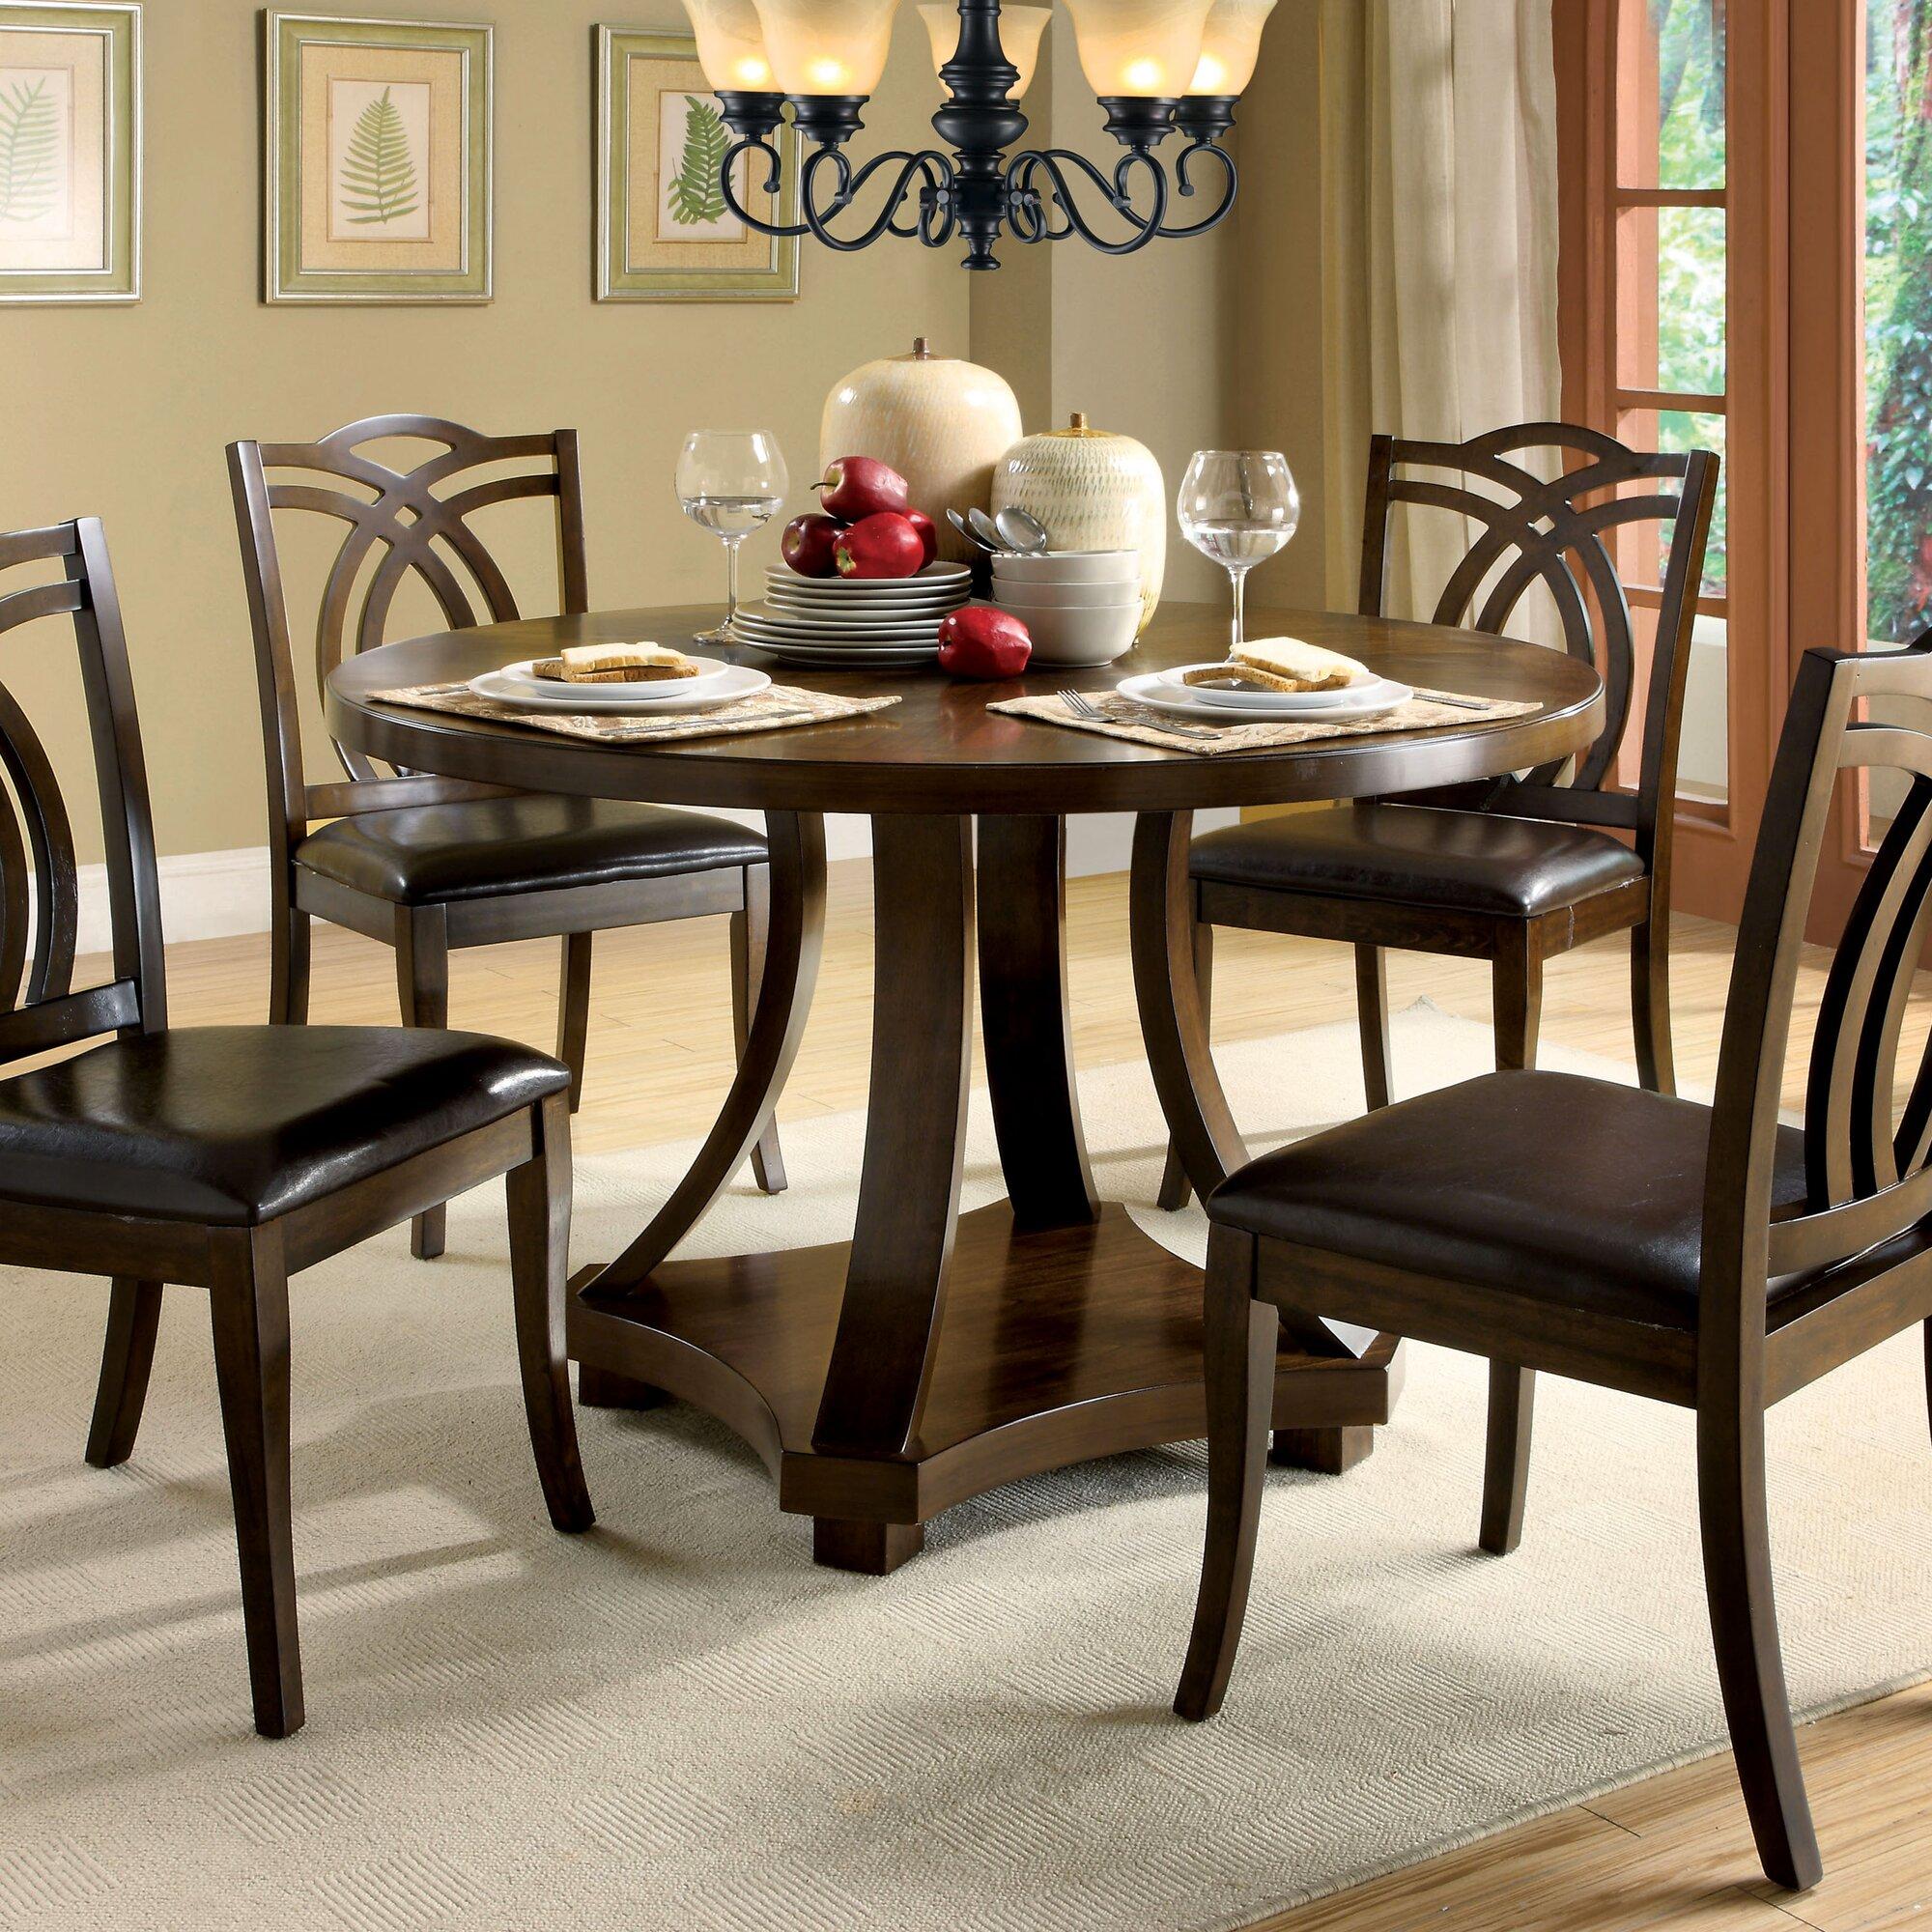 Hokku designs baldwin dining table reviews for Hokku designs dining room furniture